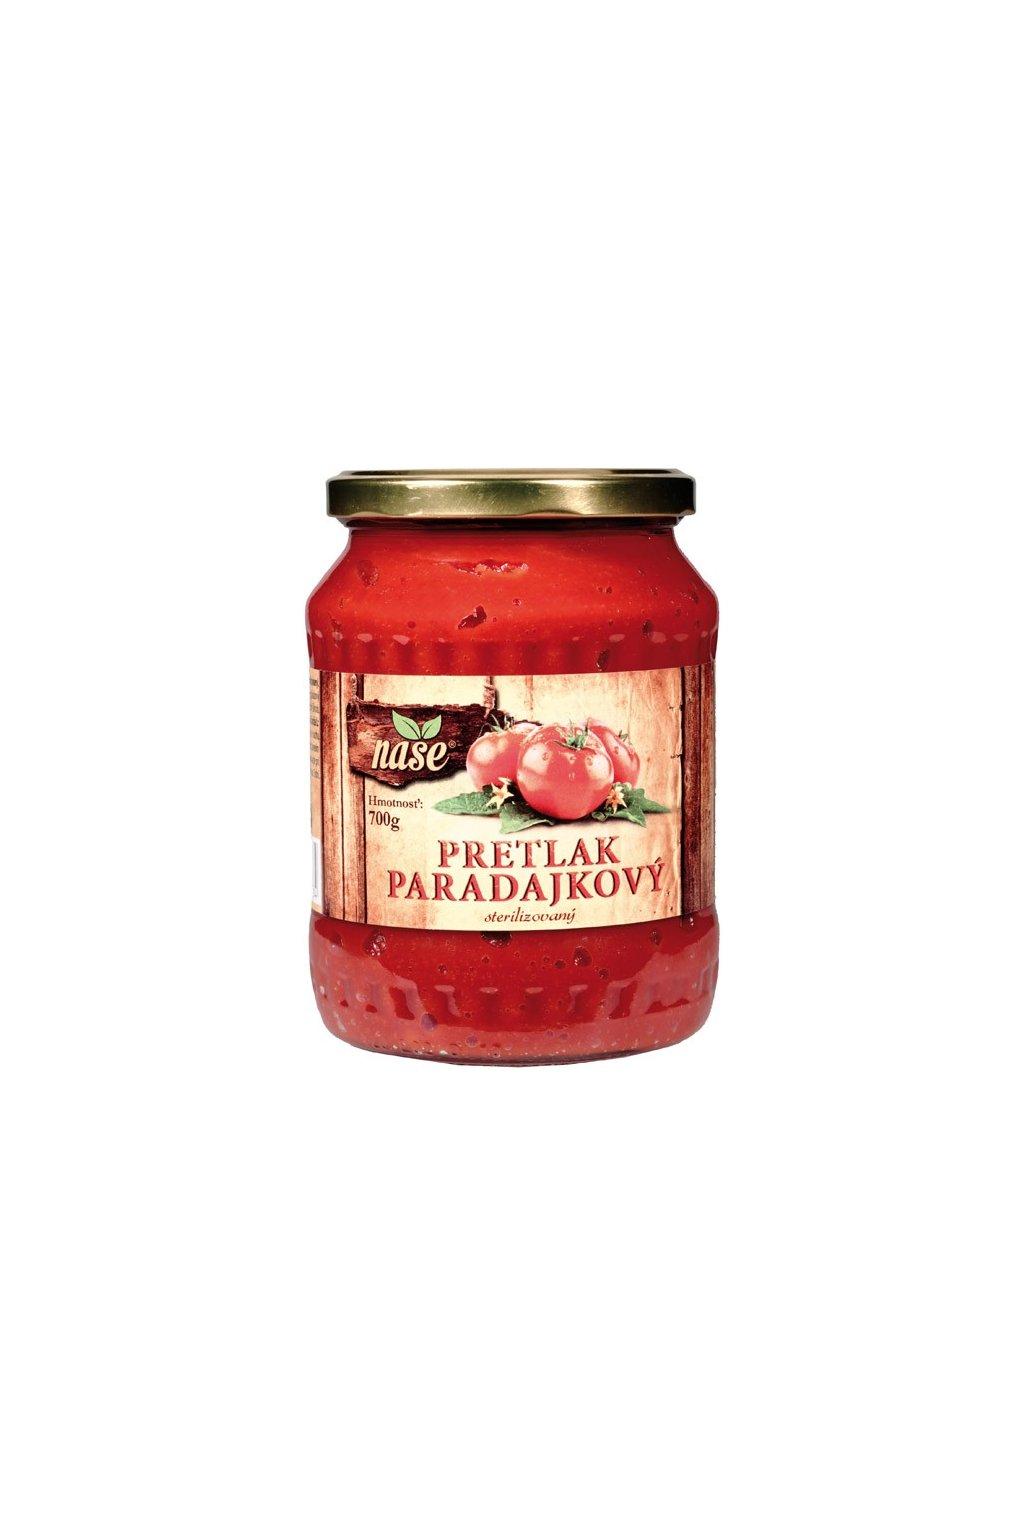 nase paradajkovy pretlak